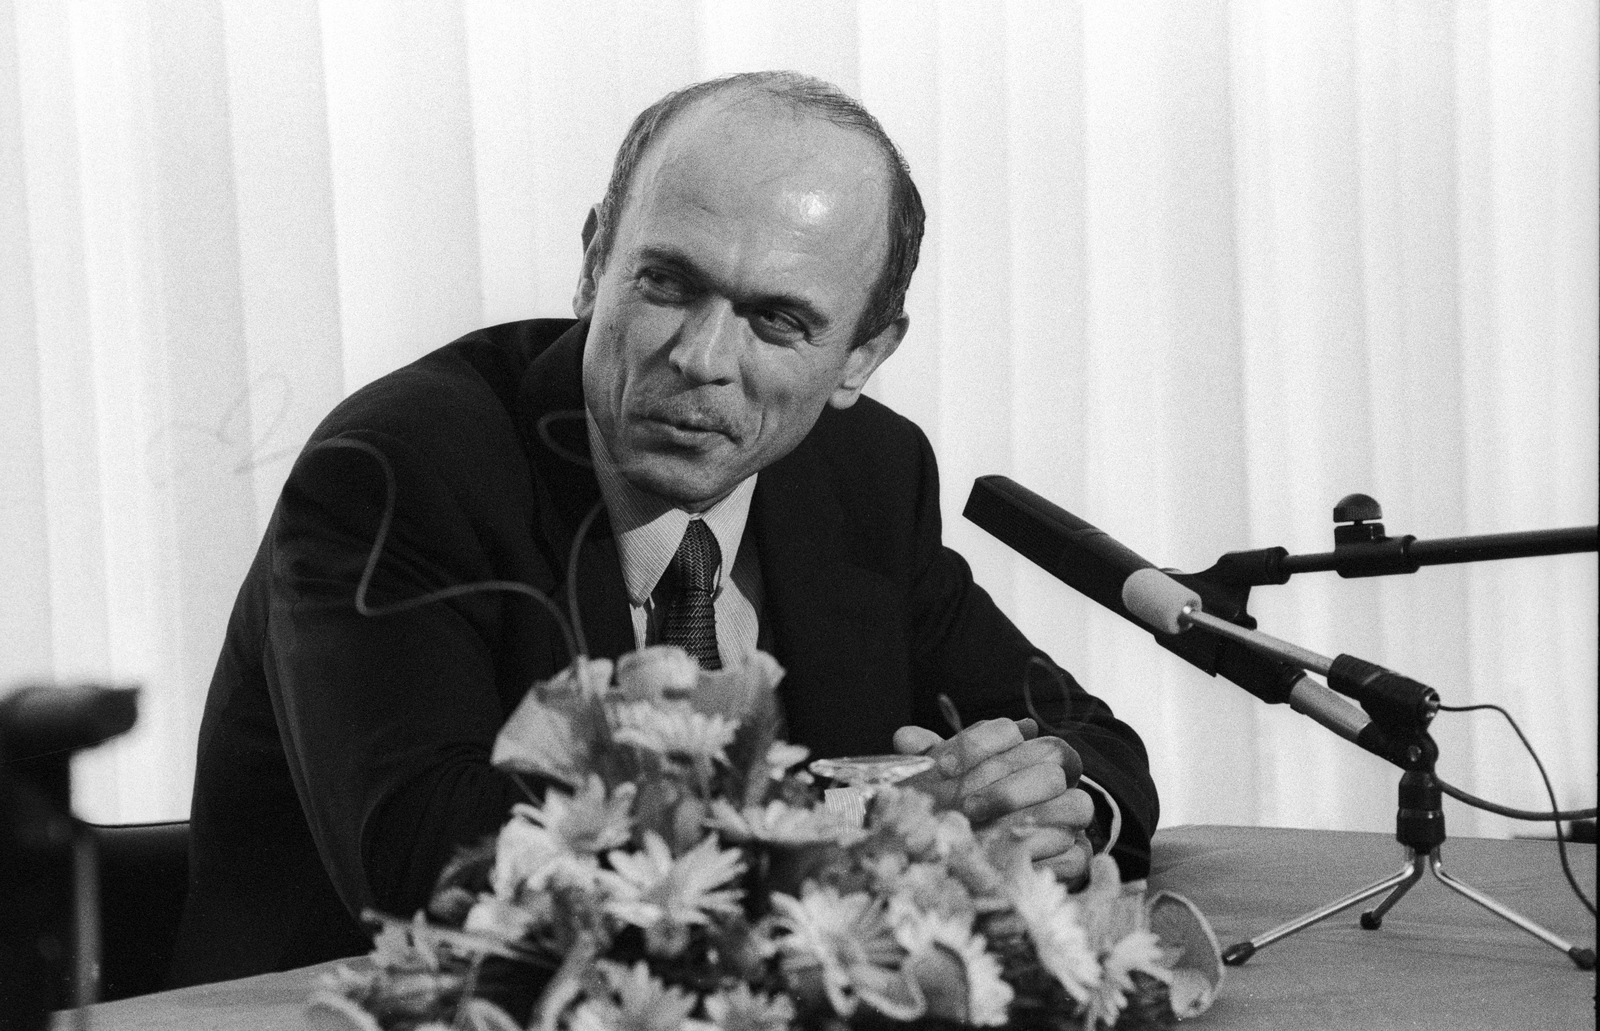 Dr. Janez Drnovšek